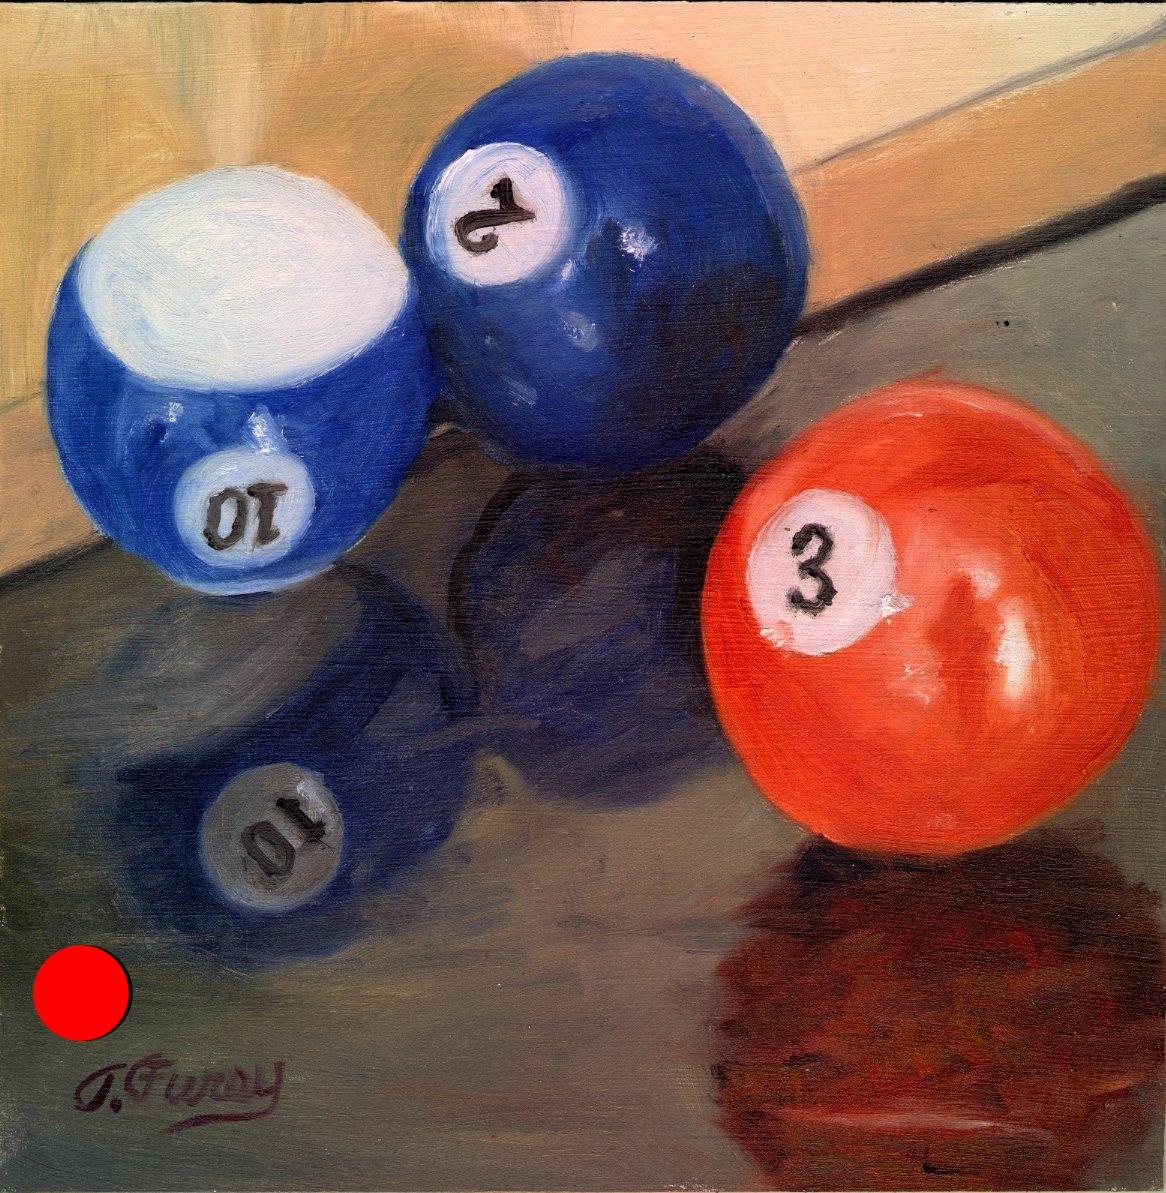 "Three Pool Balls, Alla Prima Oil Painting on Board, 8"" x 8""."